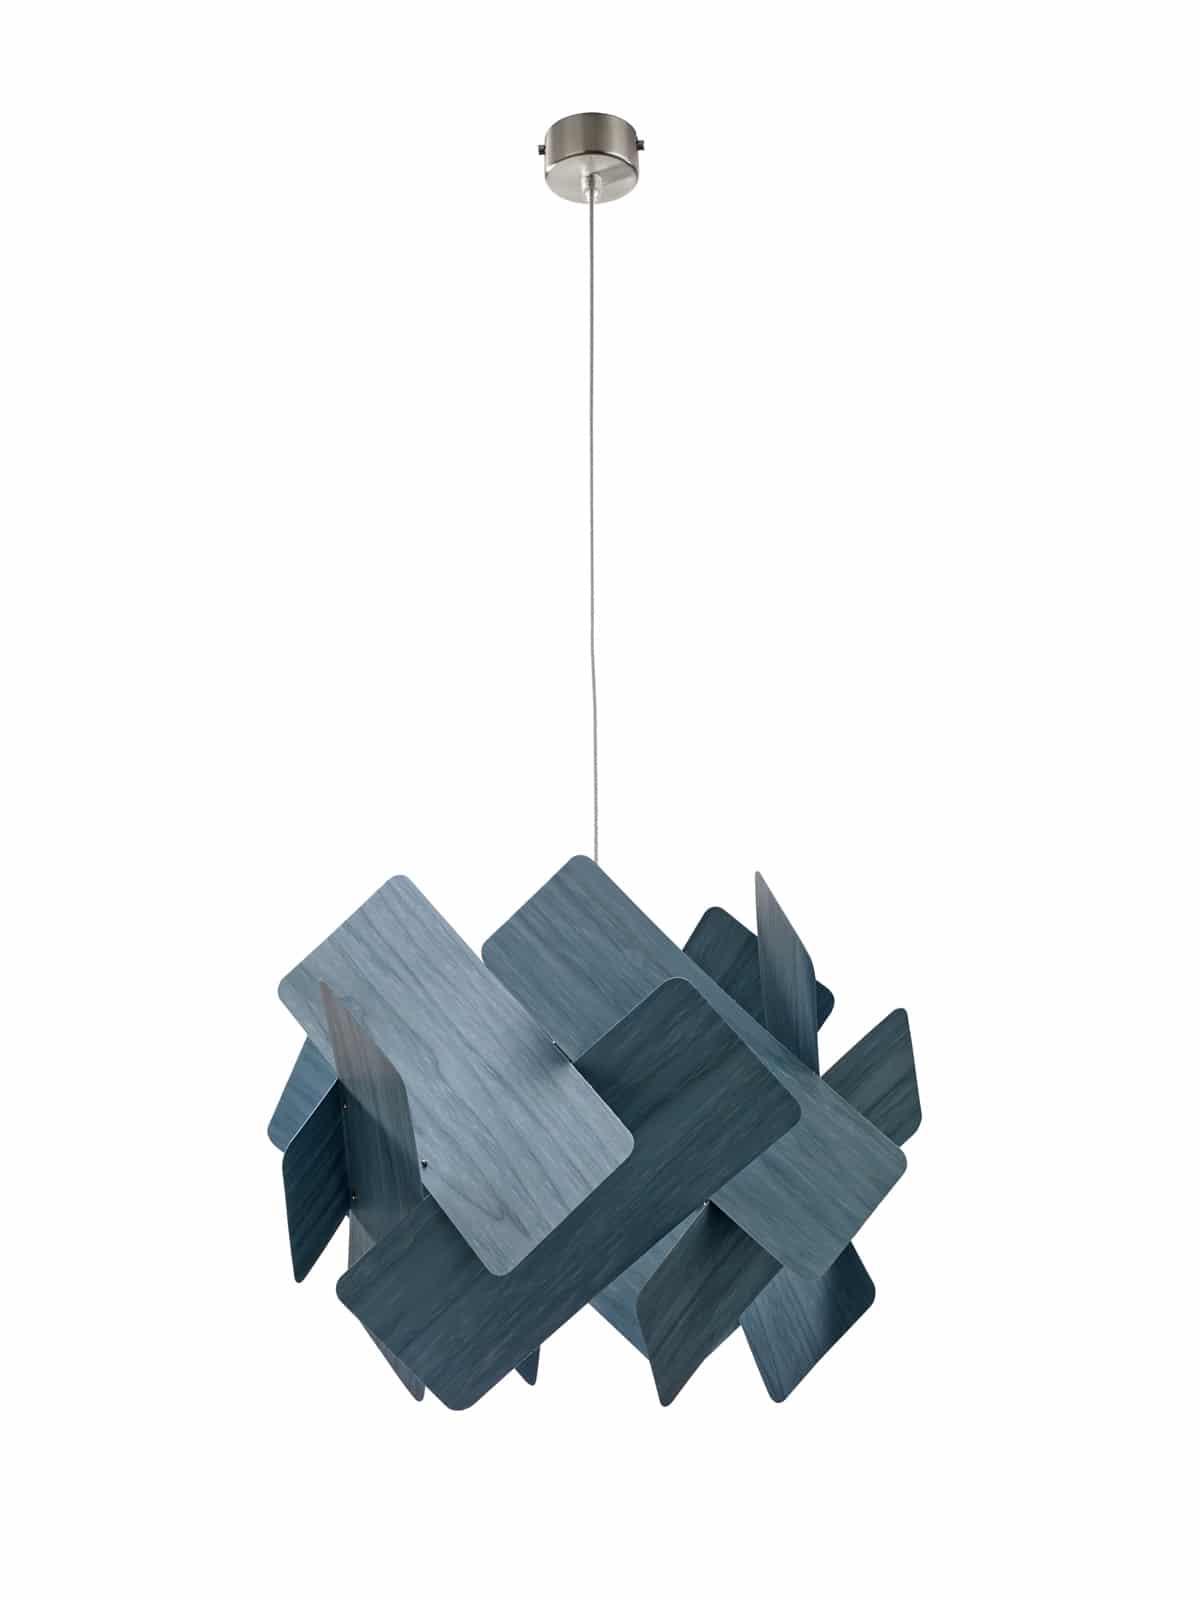 LZF Lampe Escape DesignOrt Onlineshop Berlin